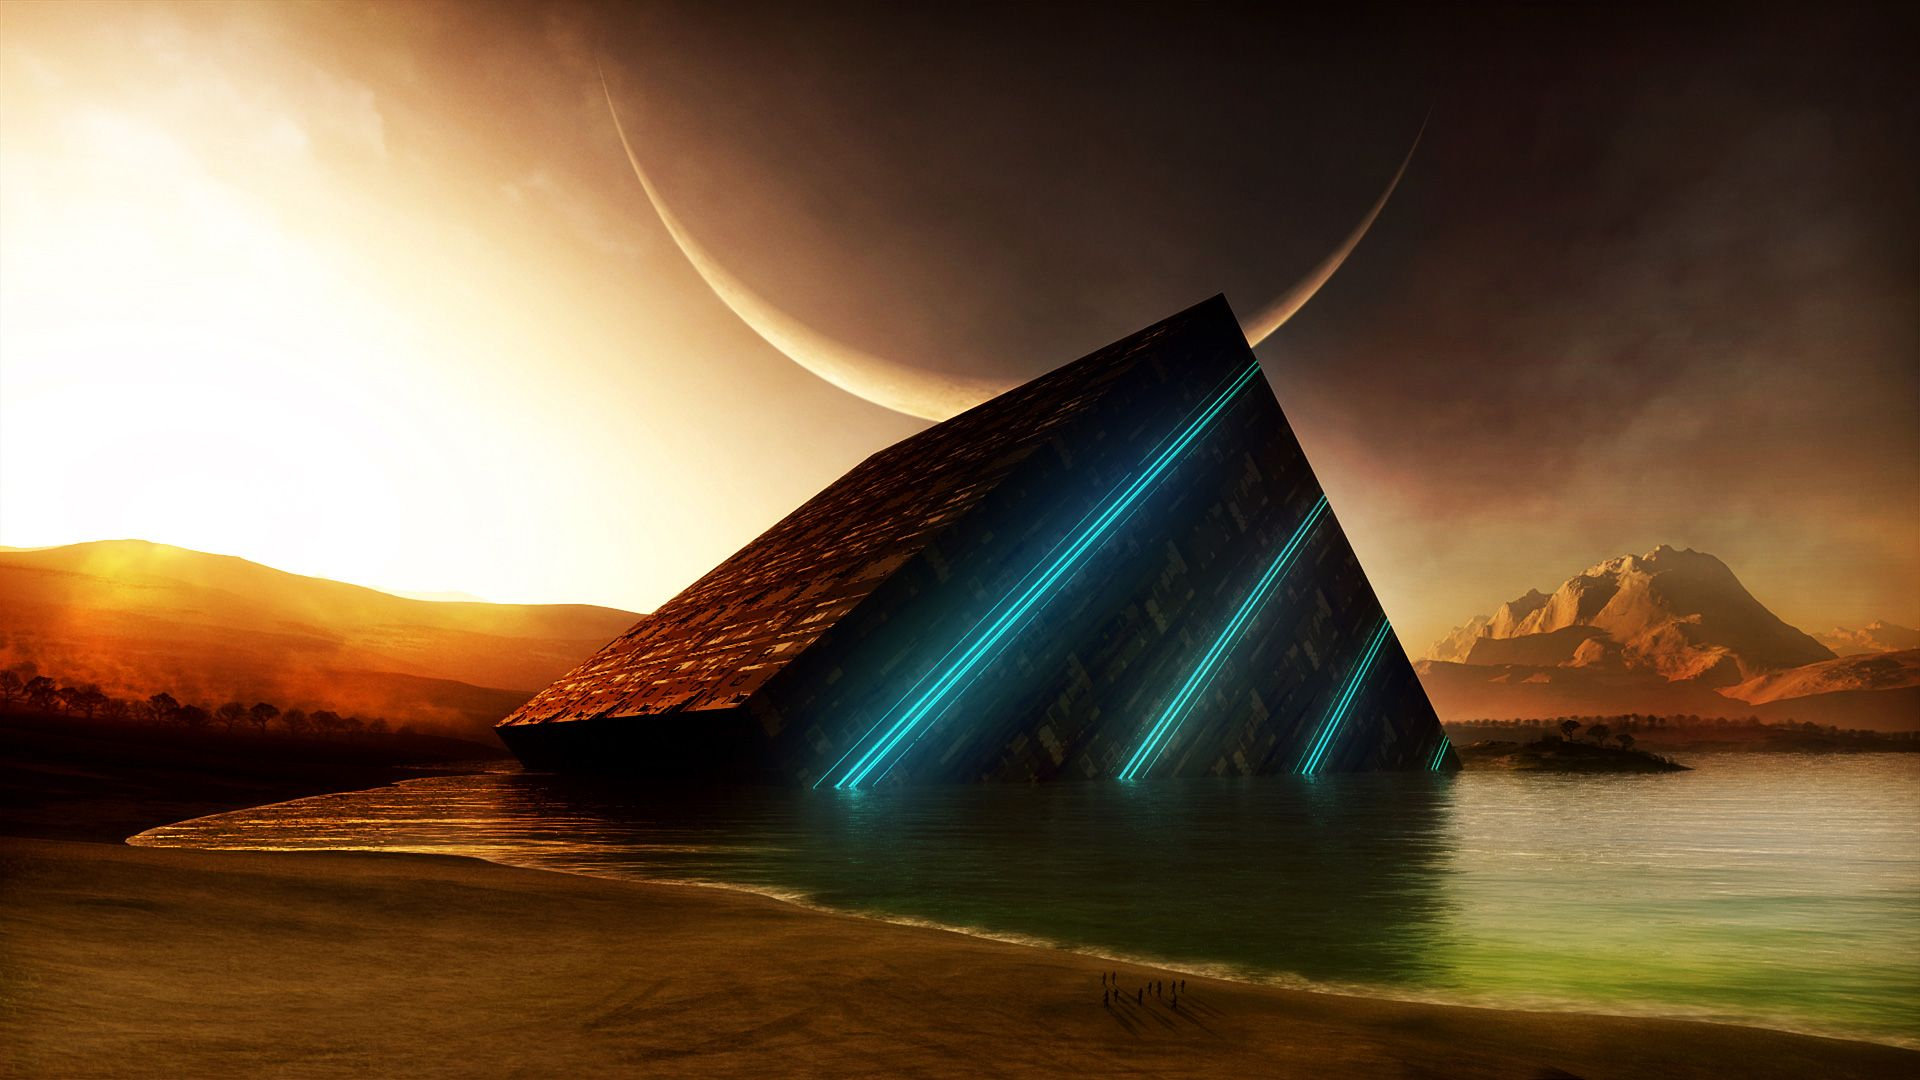 Sci Fi Desktop Backgrounds: Sci Fi Landscape Wallpaper Desktop Background #tdj